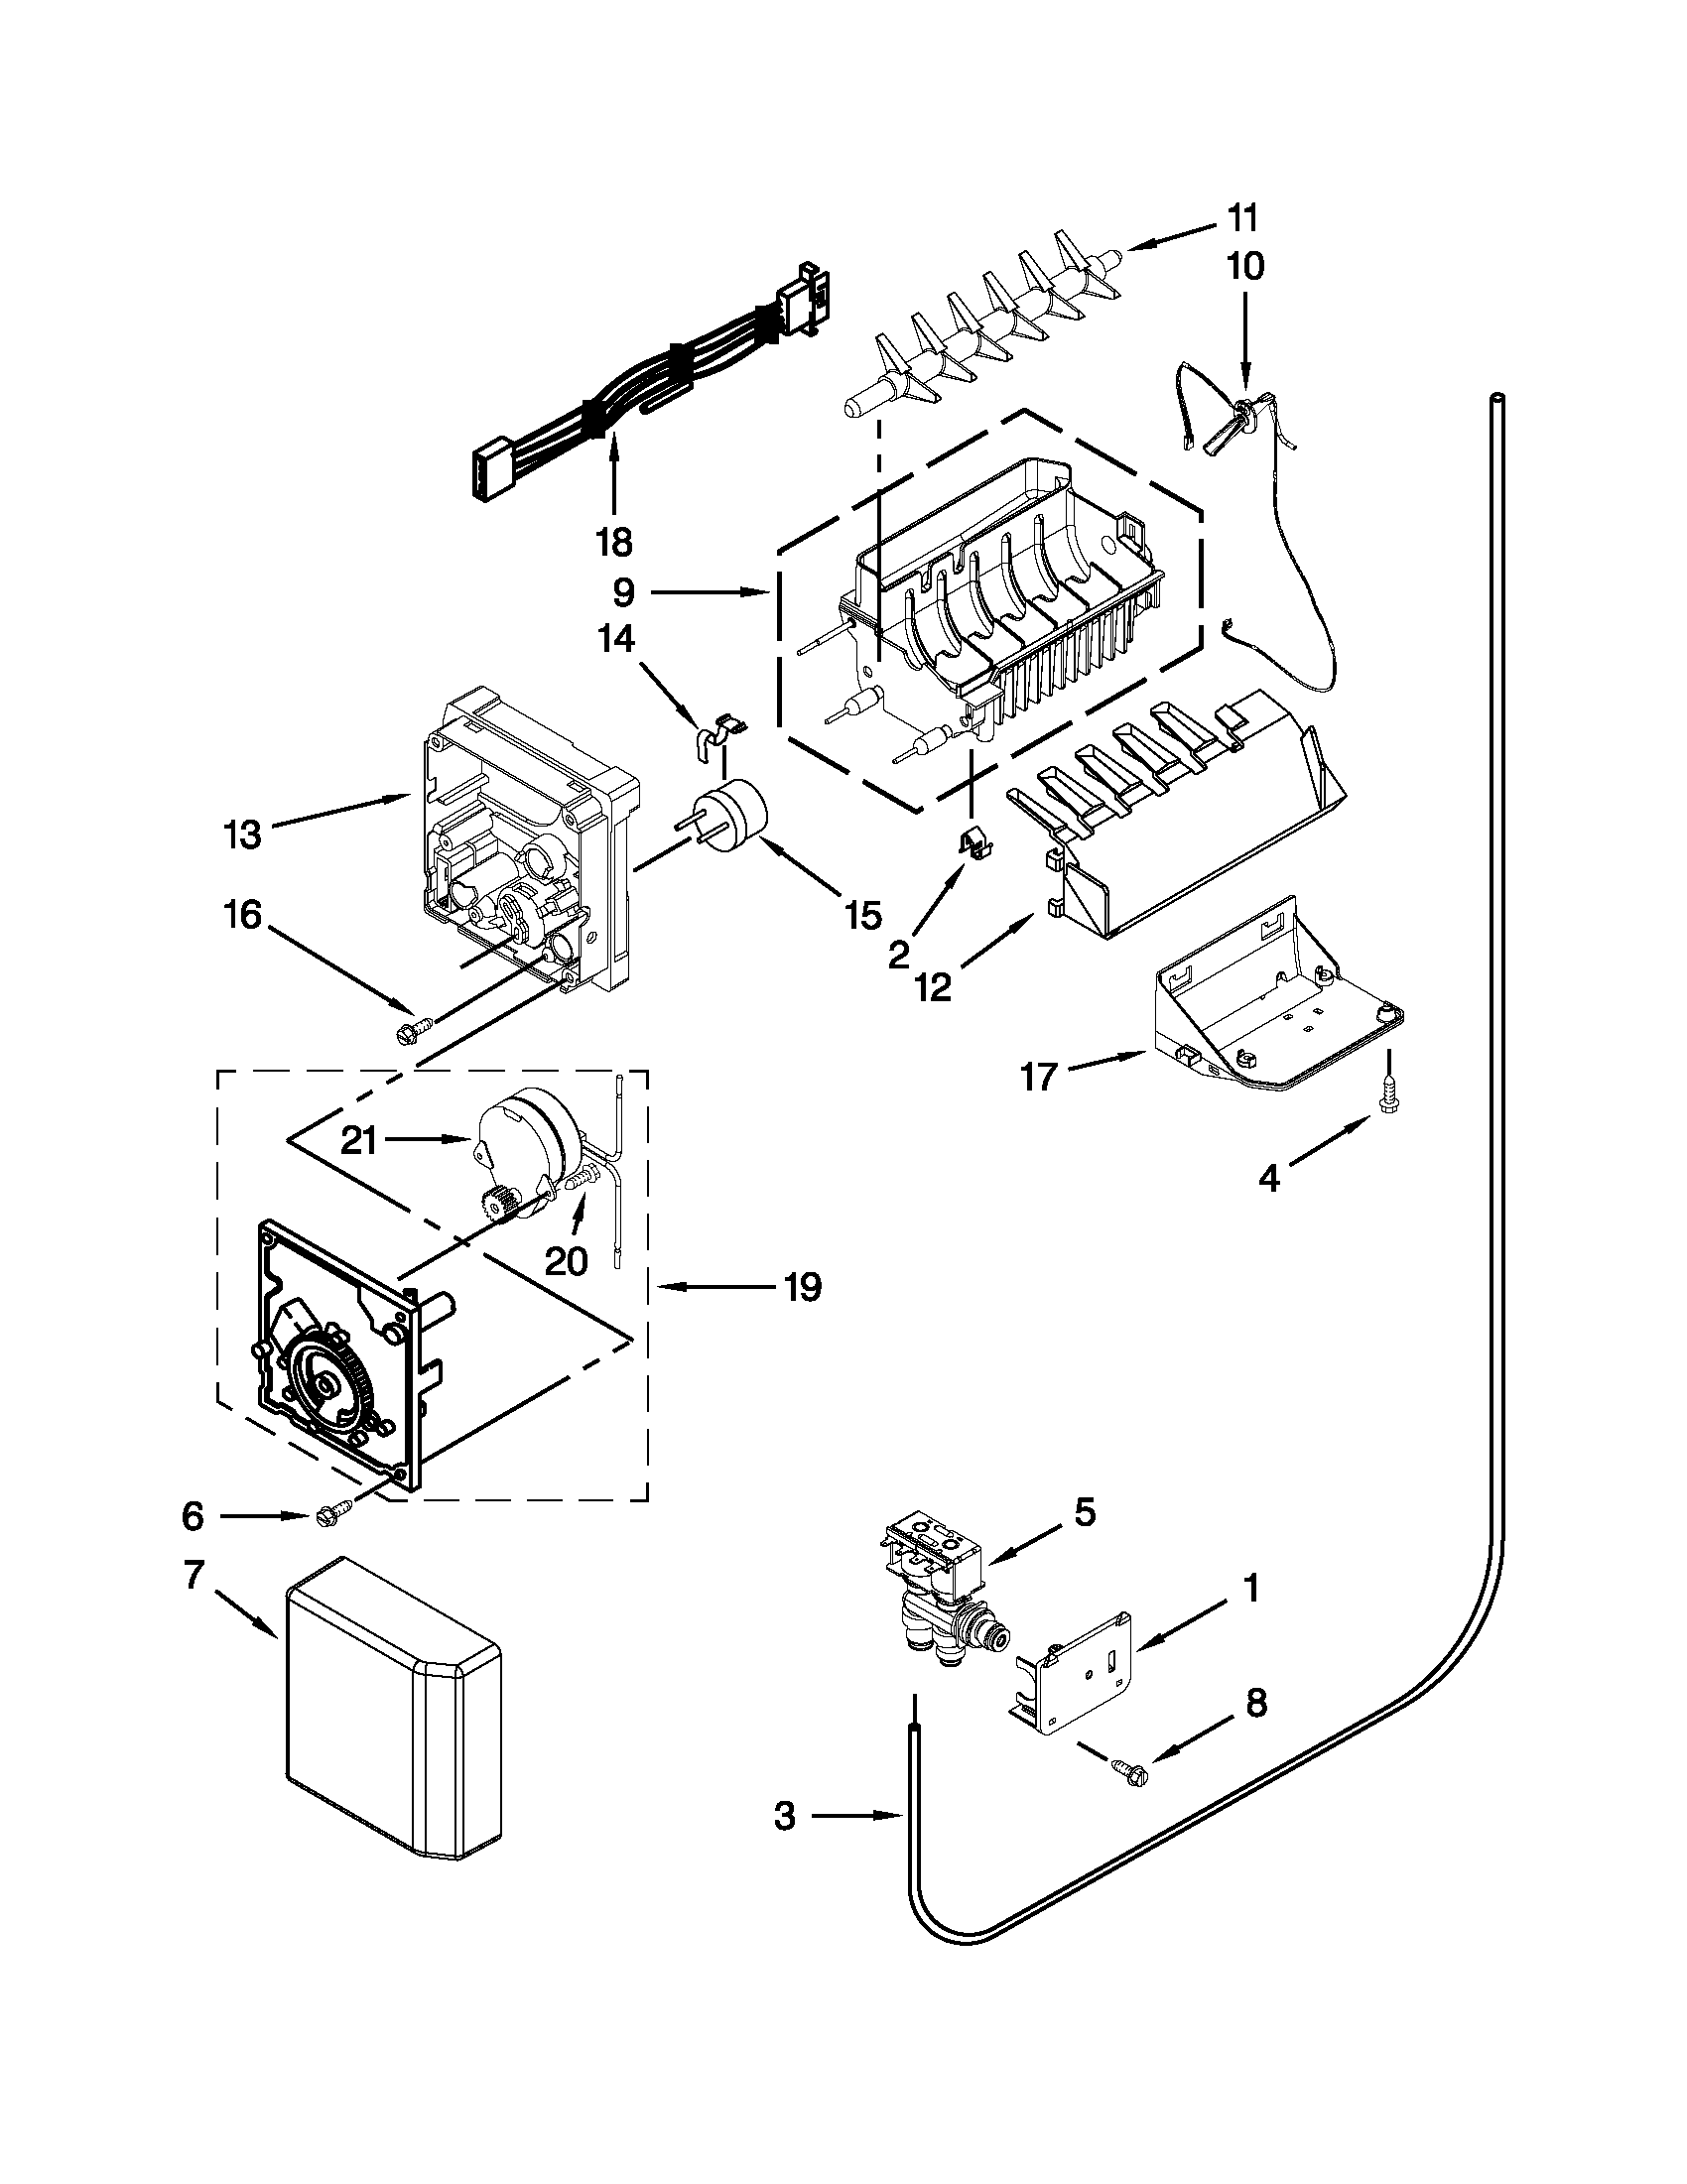 ICE MAKER Diagram & Parts List for Model 10641162310